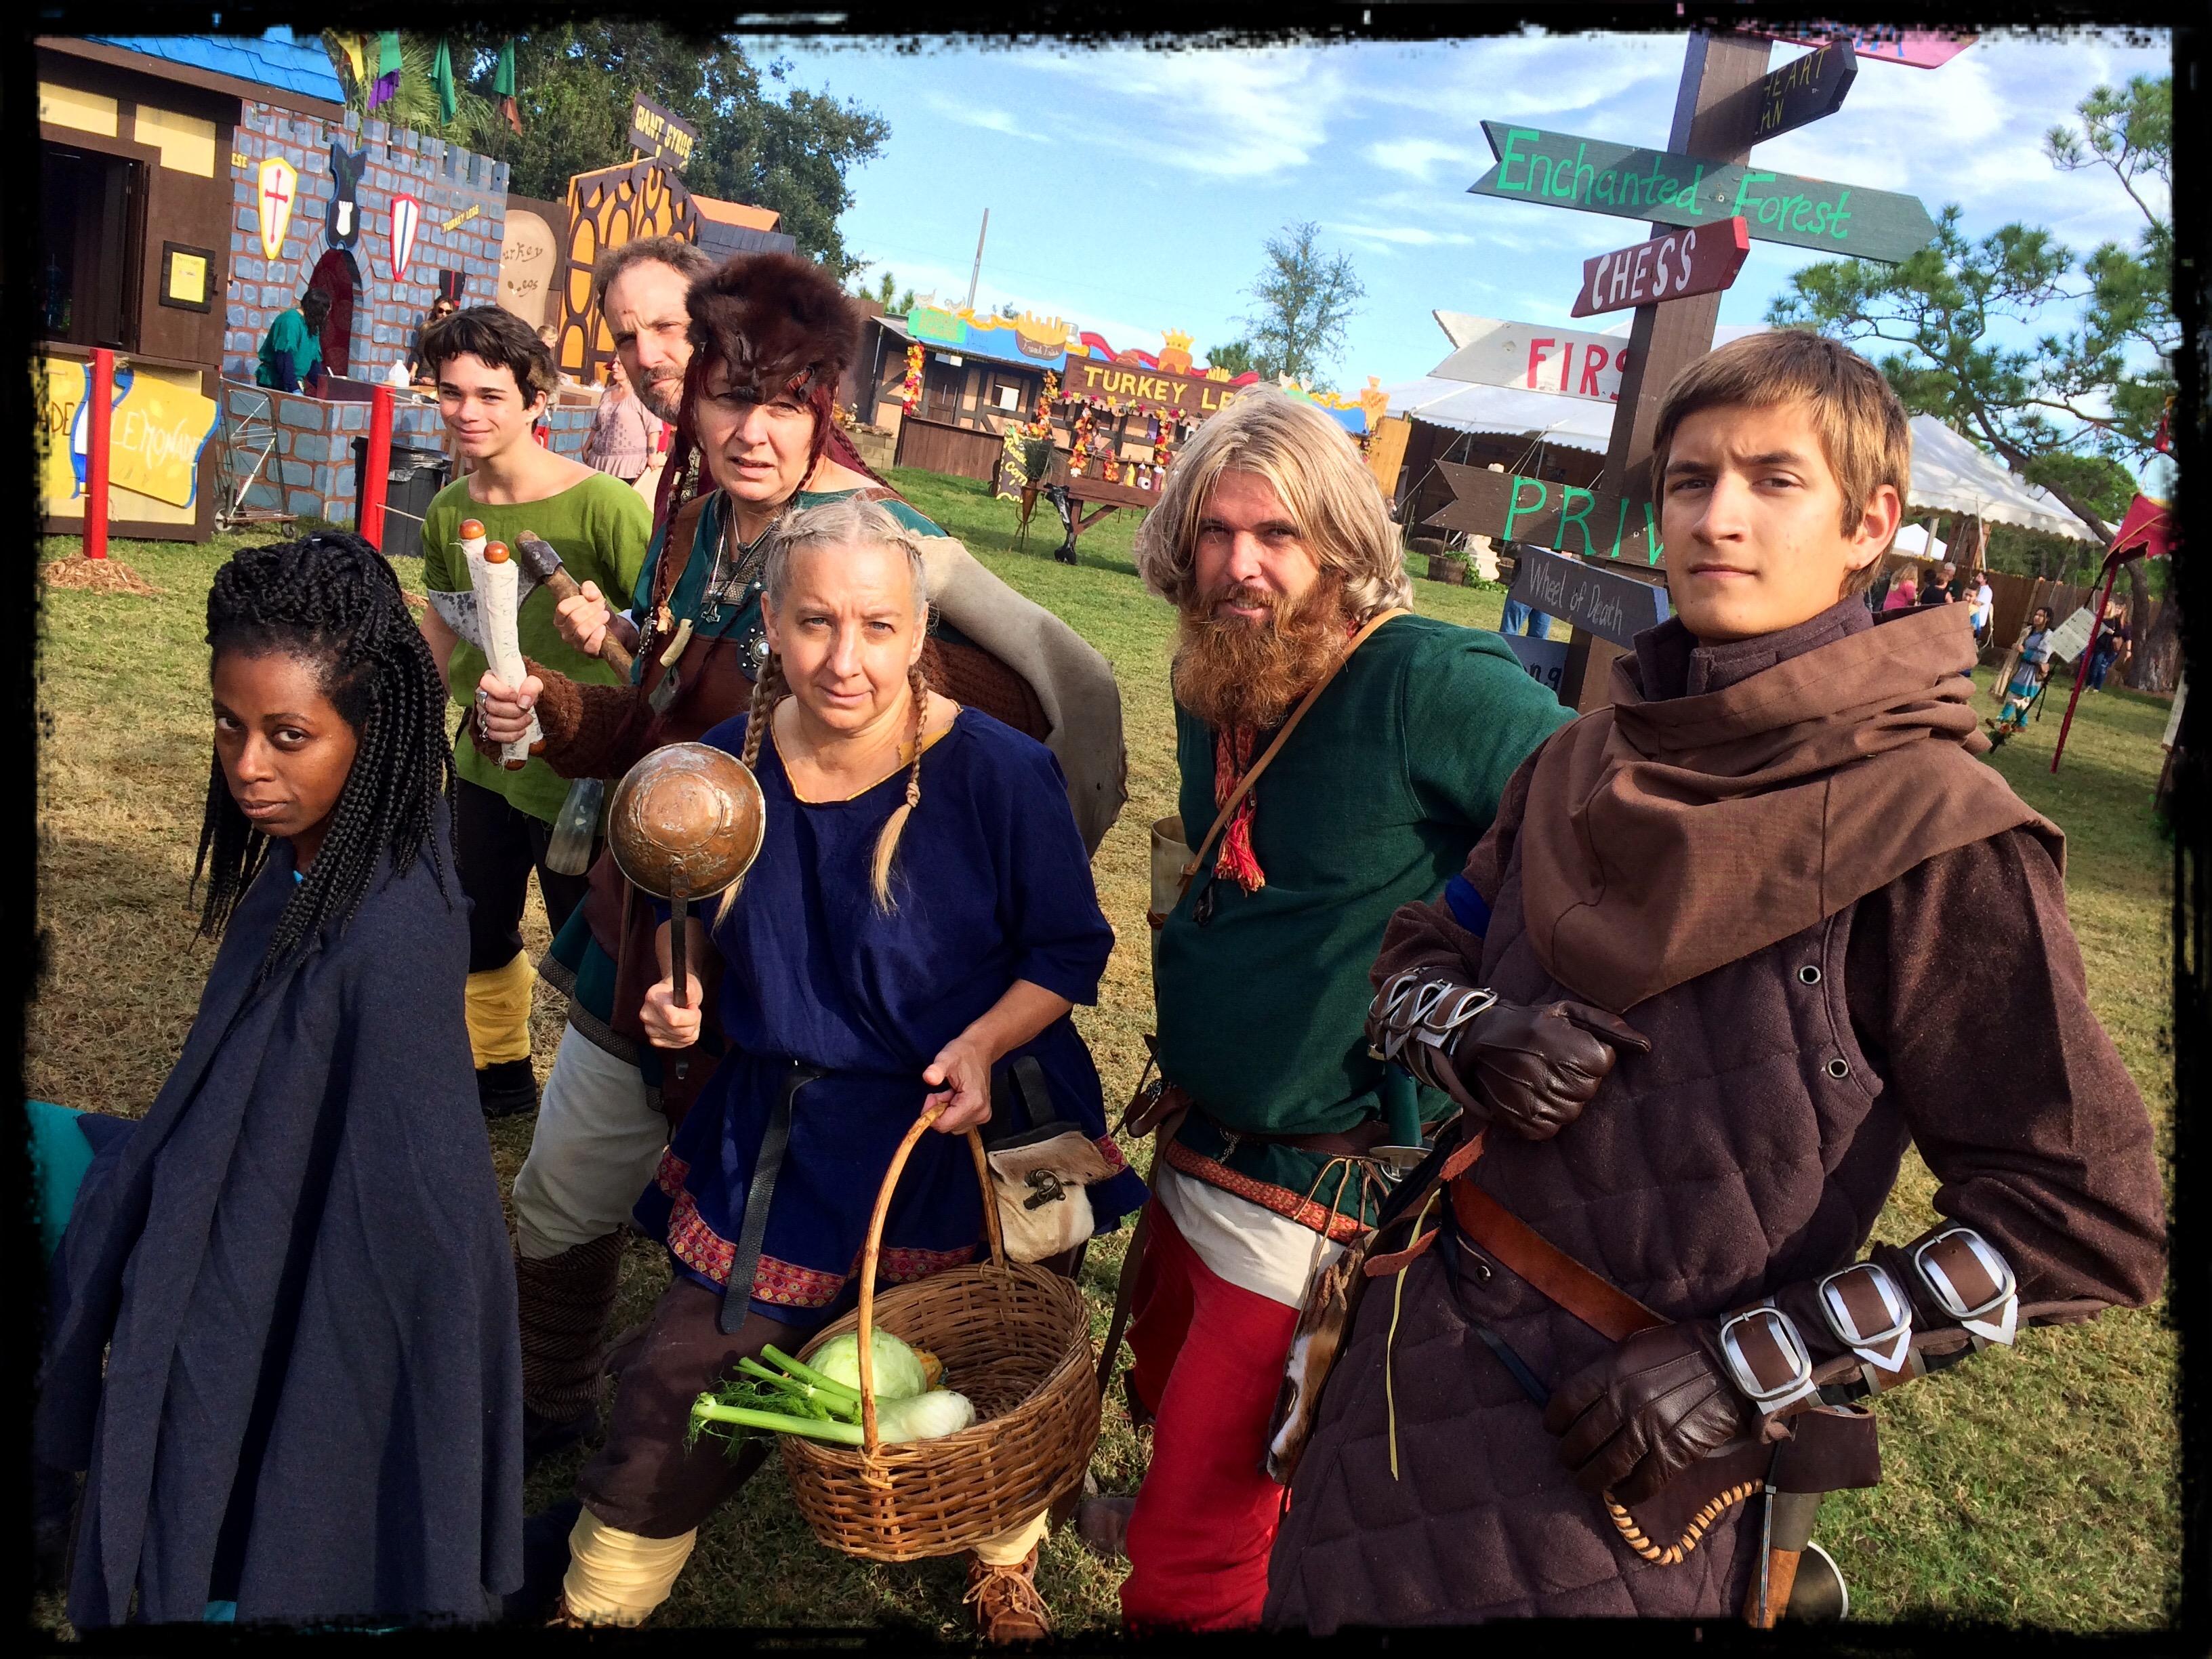 Annual medieval fair returns to the Sarasota Fairgrounds